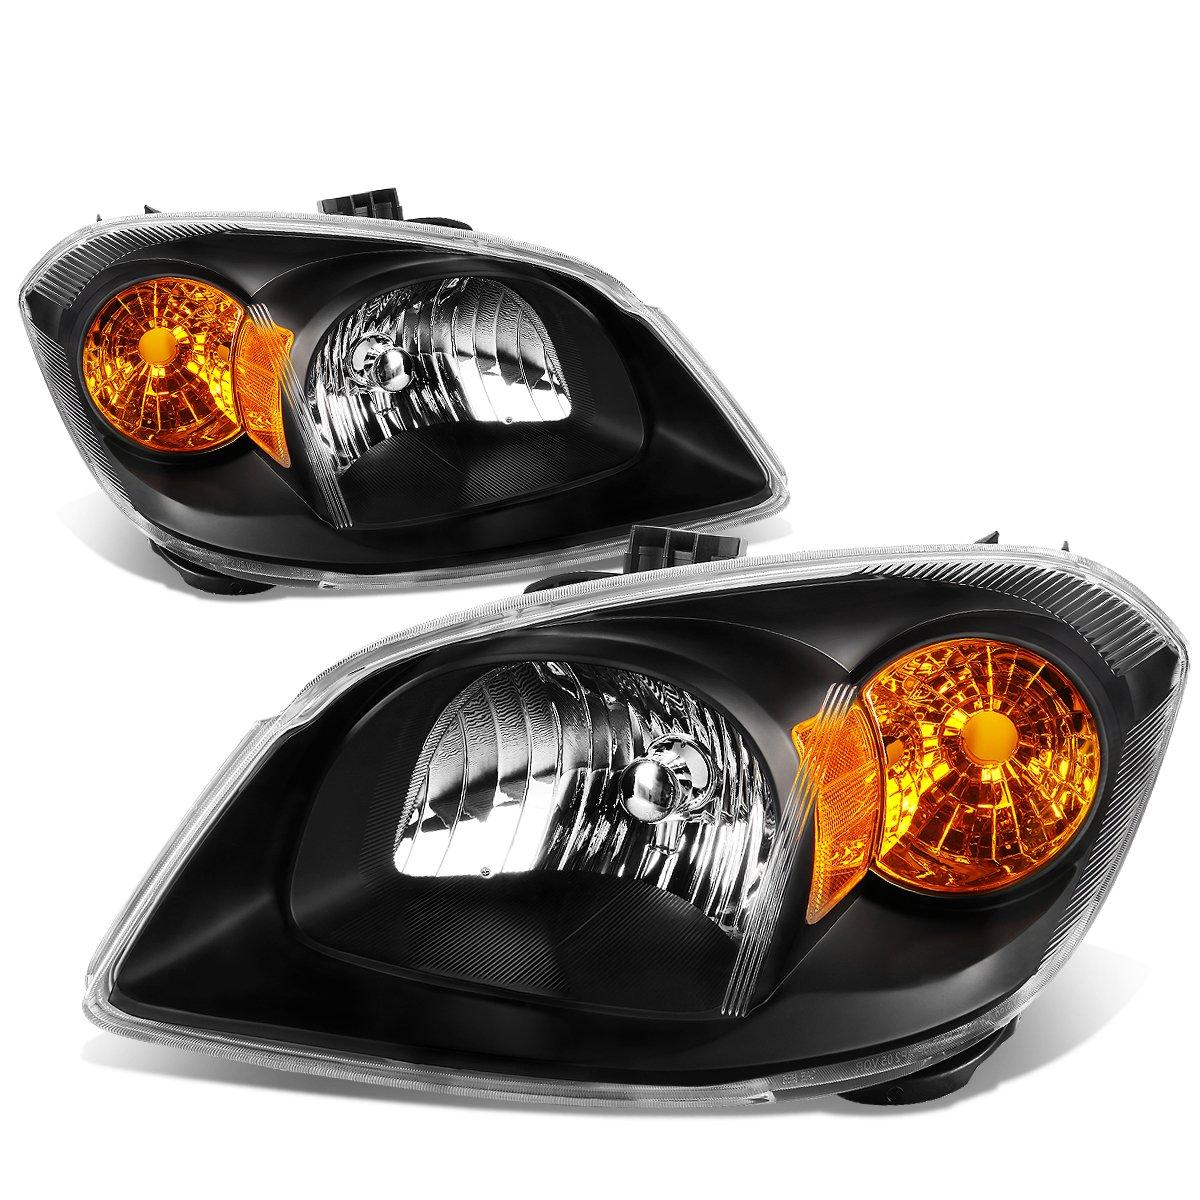 For Chevy Cobalt//Pontiac G5//Pursuit Pair of Black Housing Amber Corner OE Style Headlight